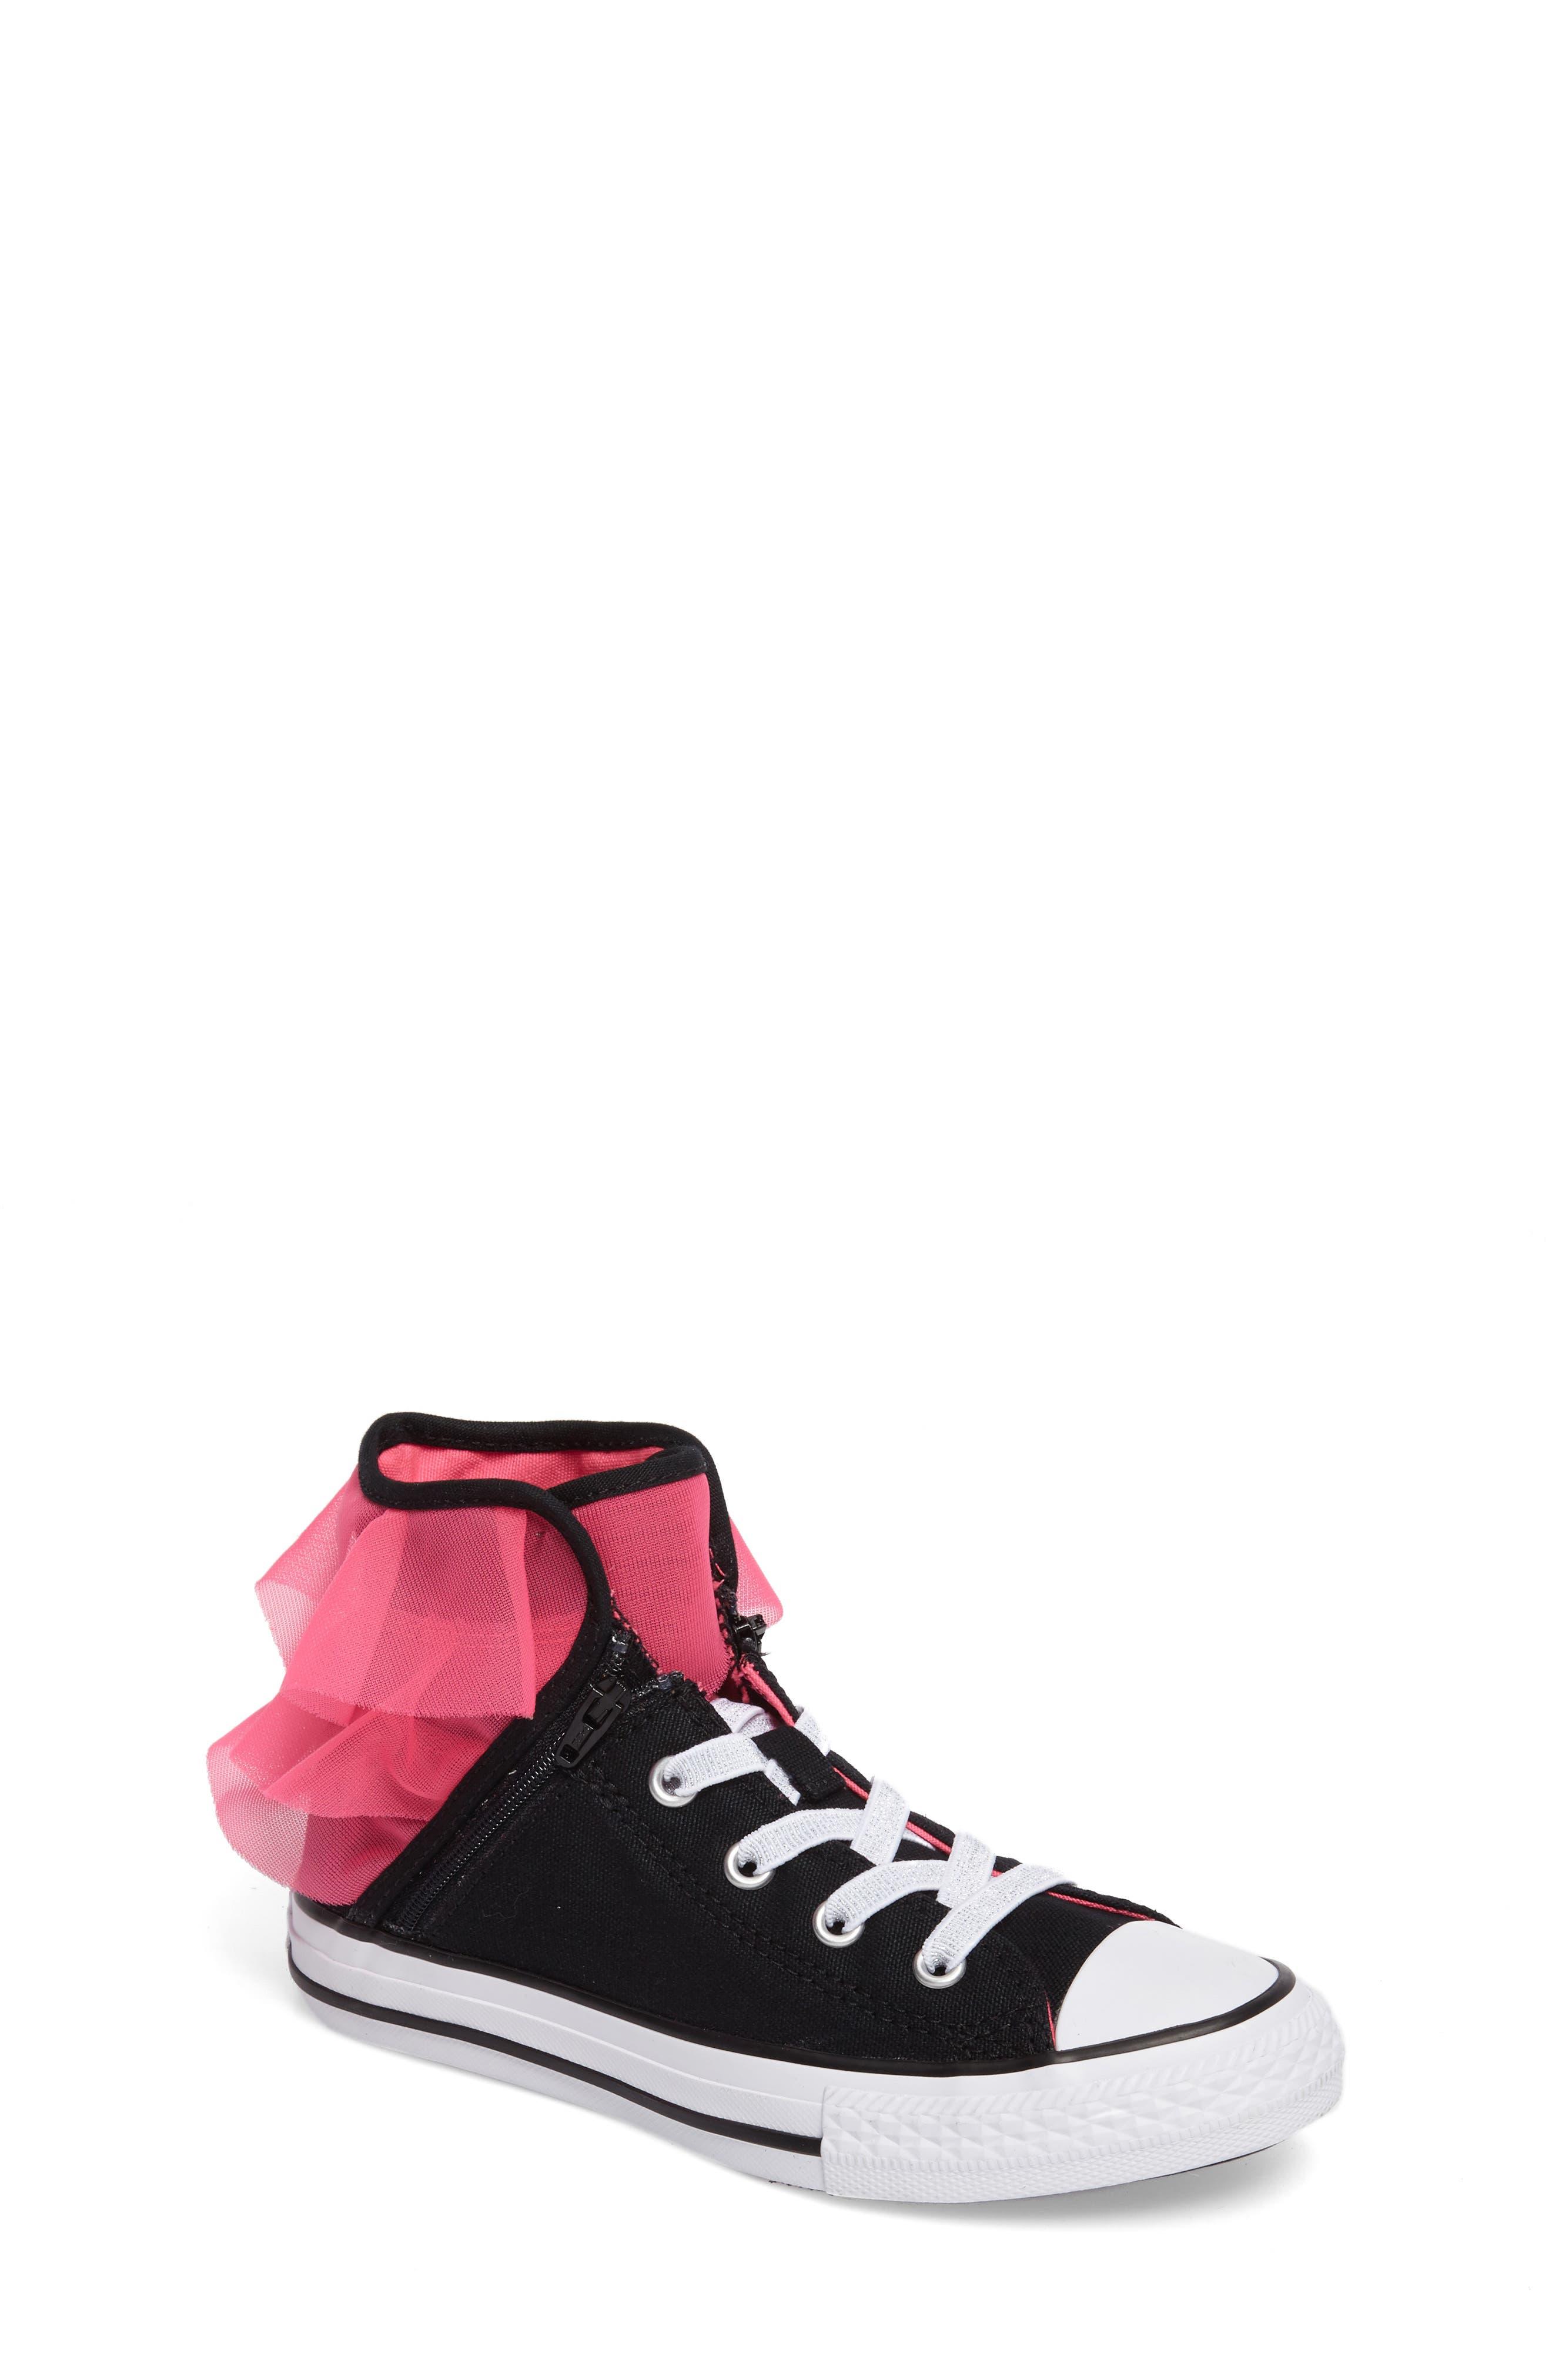 Converse Block Party High Top Sneaker (Baby, Walker, Toddler, Little Kid & Big Kid)